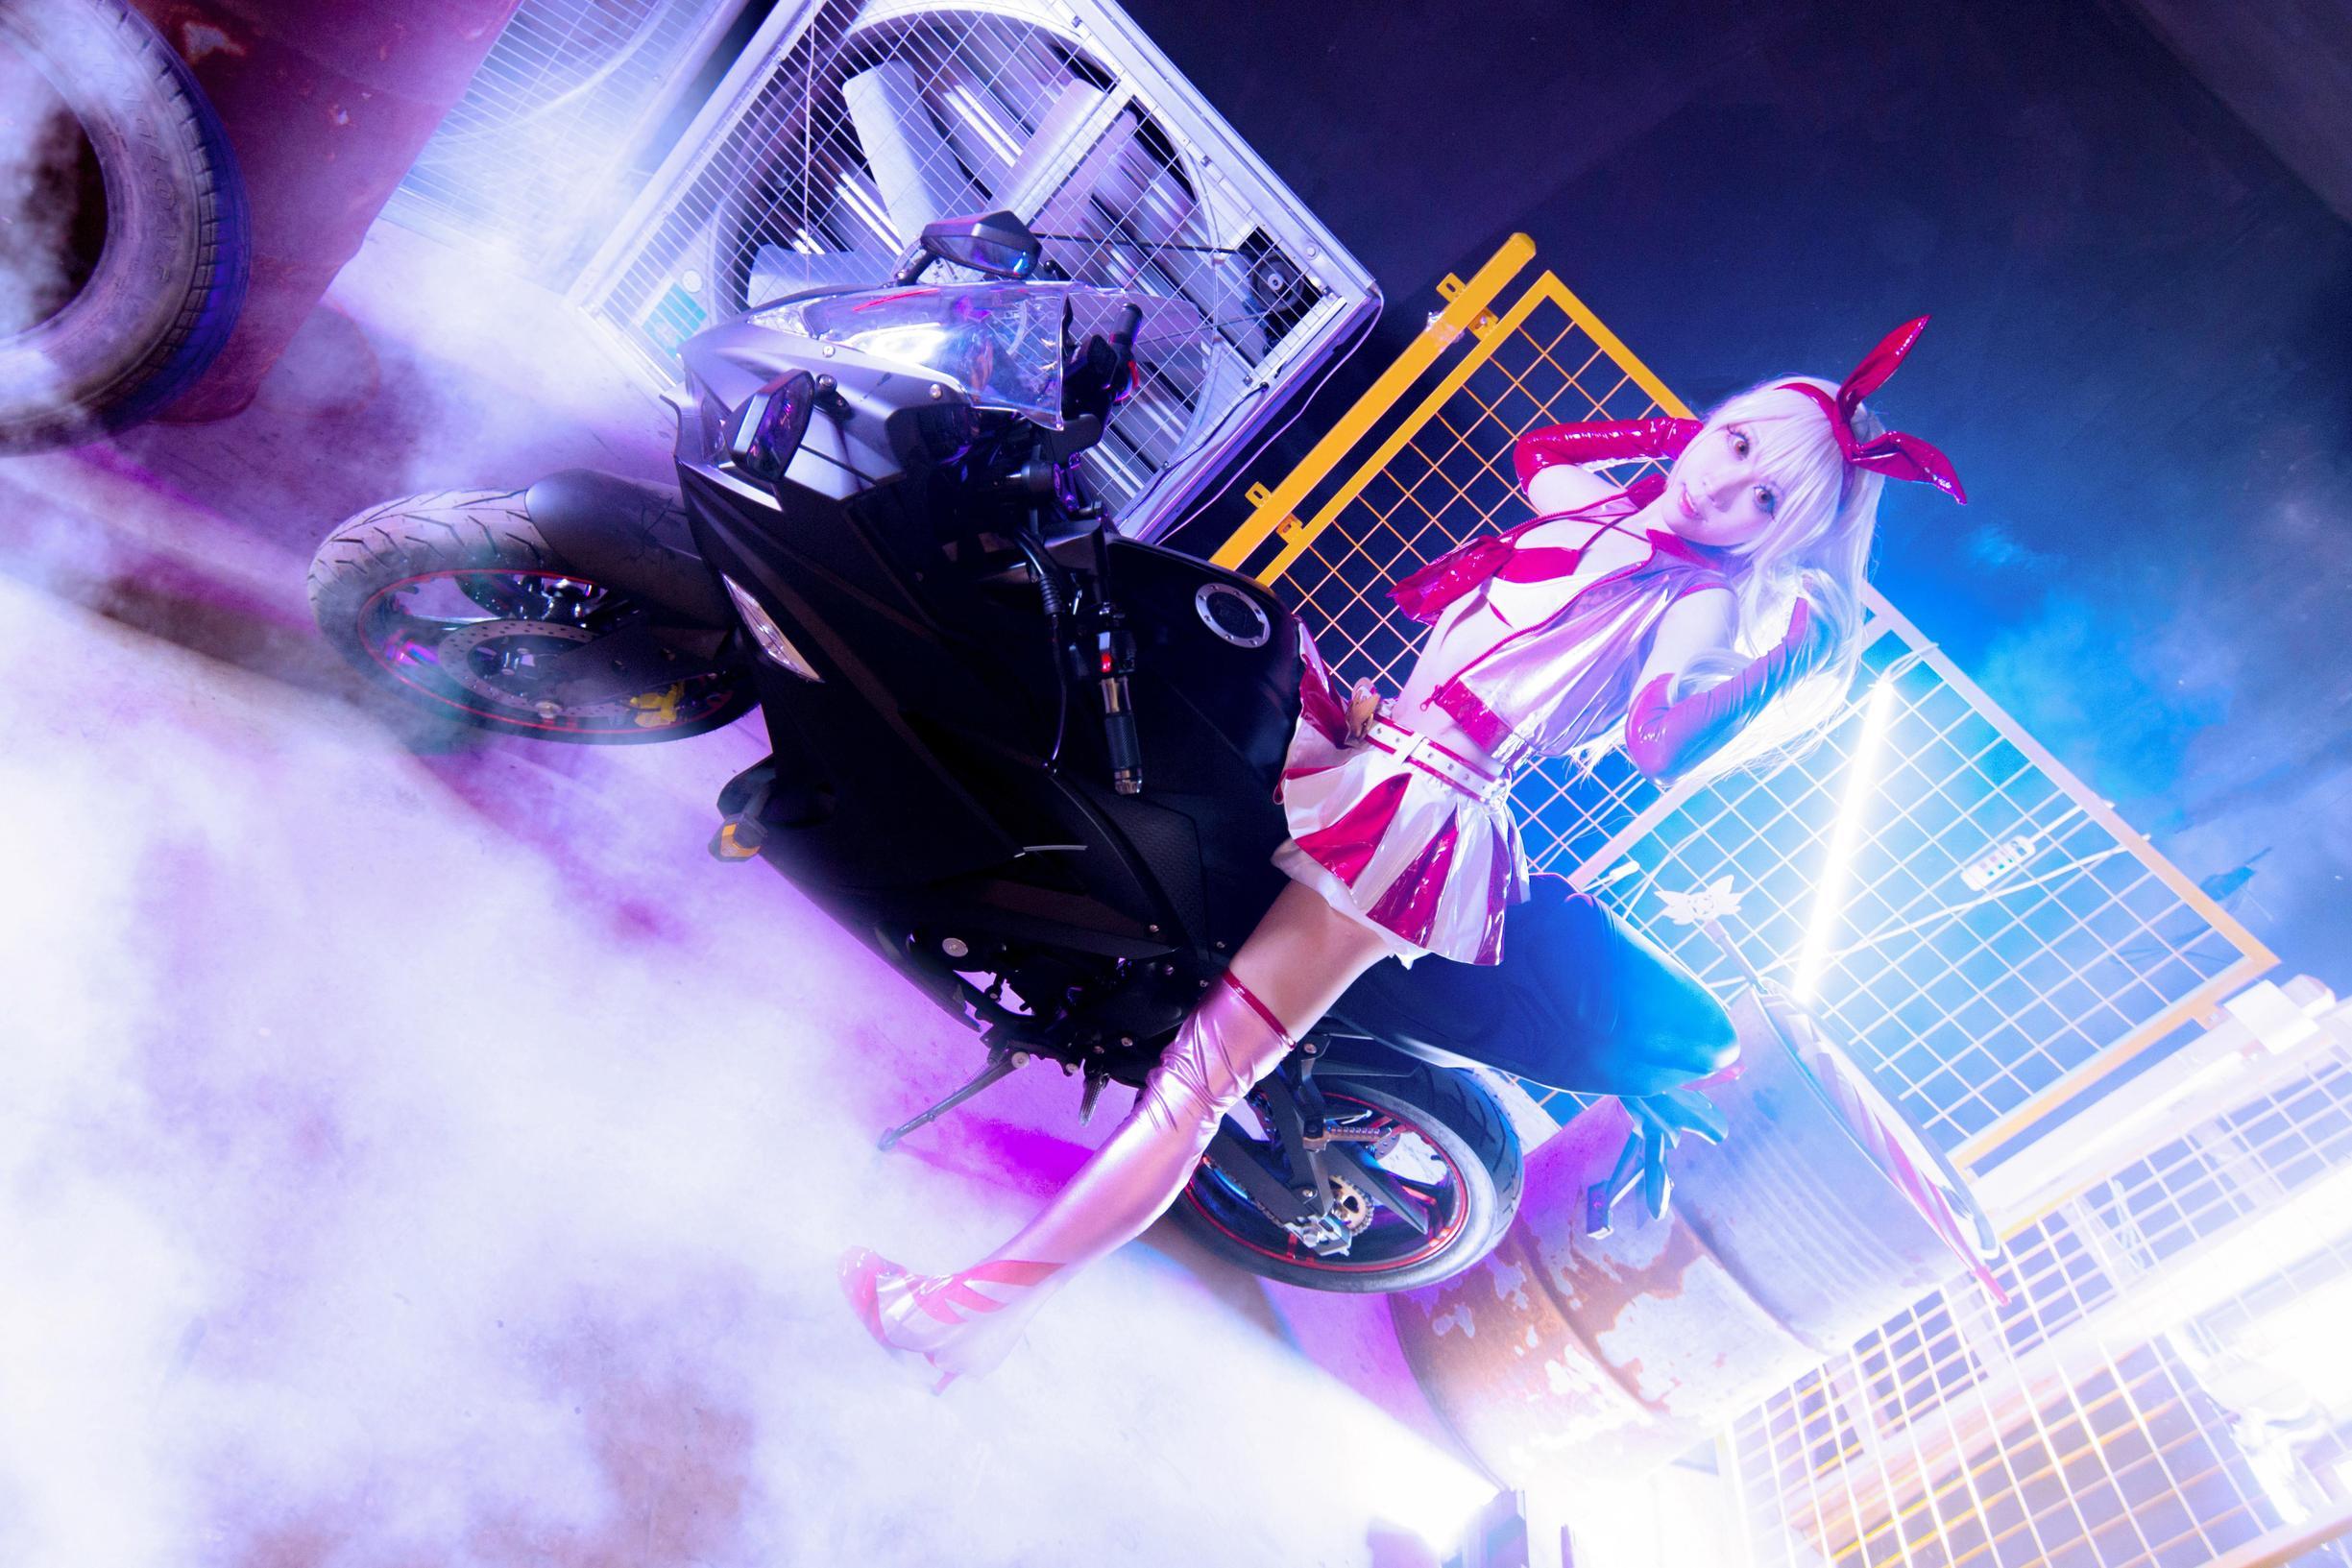 《FATE/GRAND ORDER》赛车娘cosplay【CN:梦梦100织】-第3张